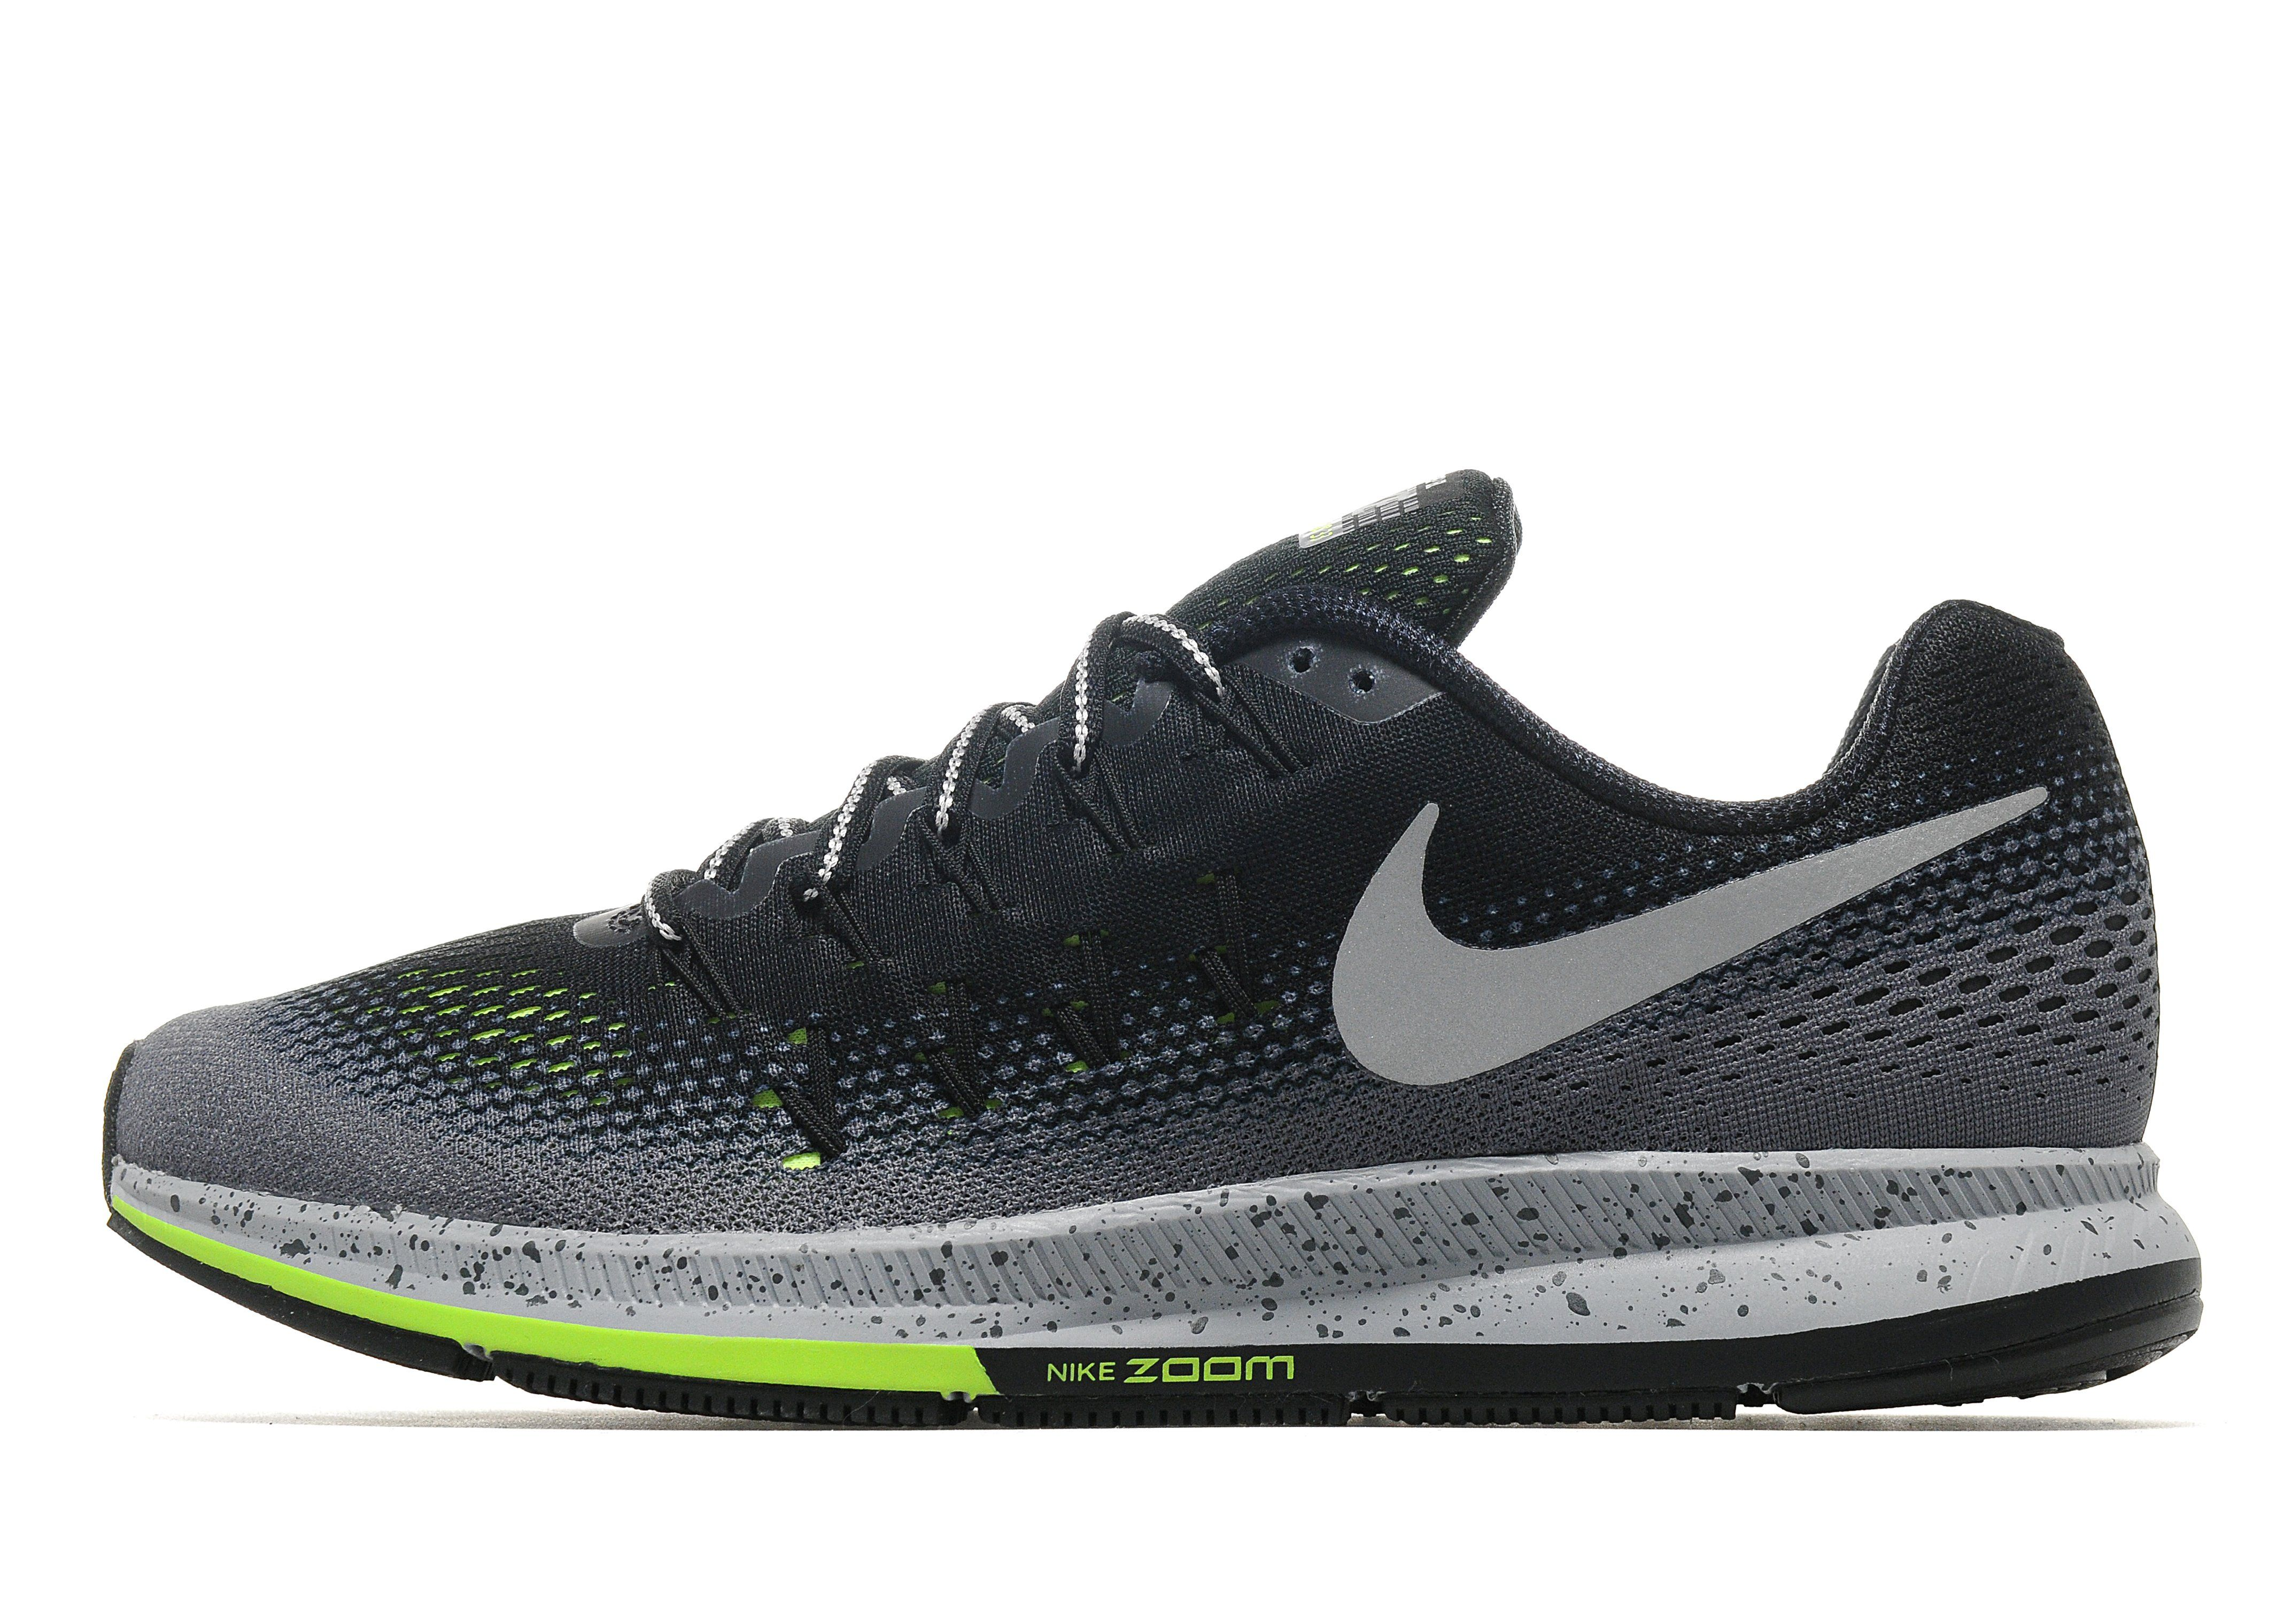 60%OFF Nike Zoom Pegasus 33 | JD Sports